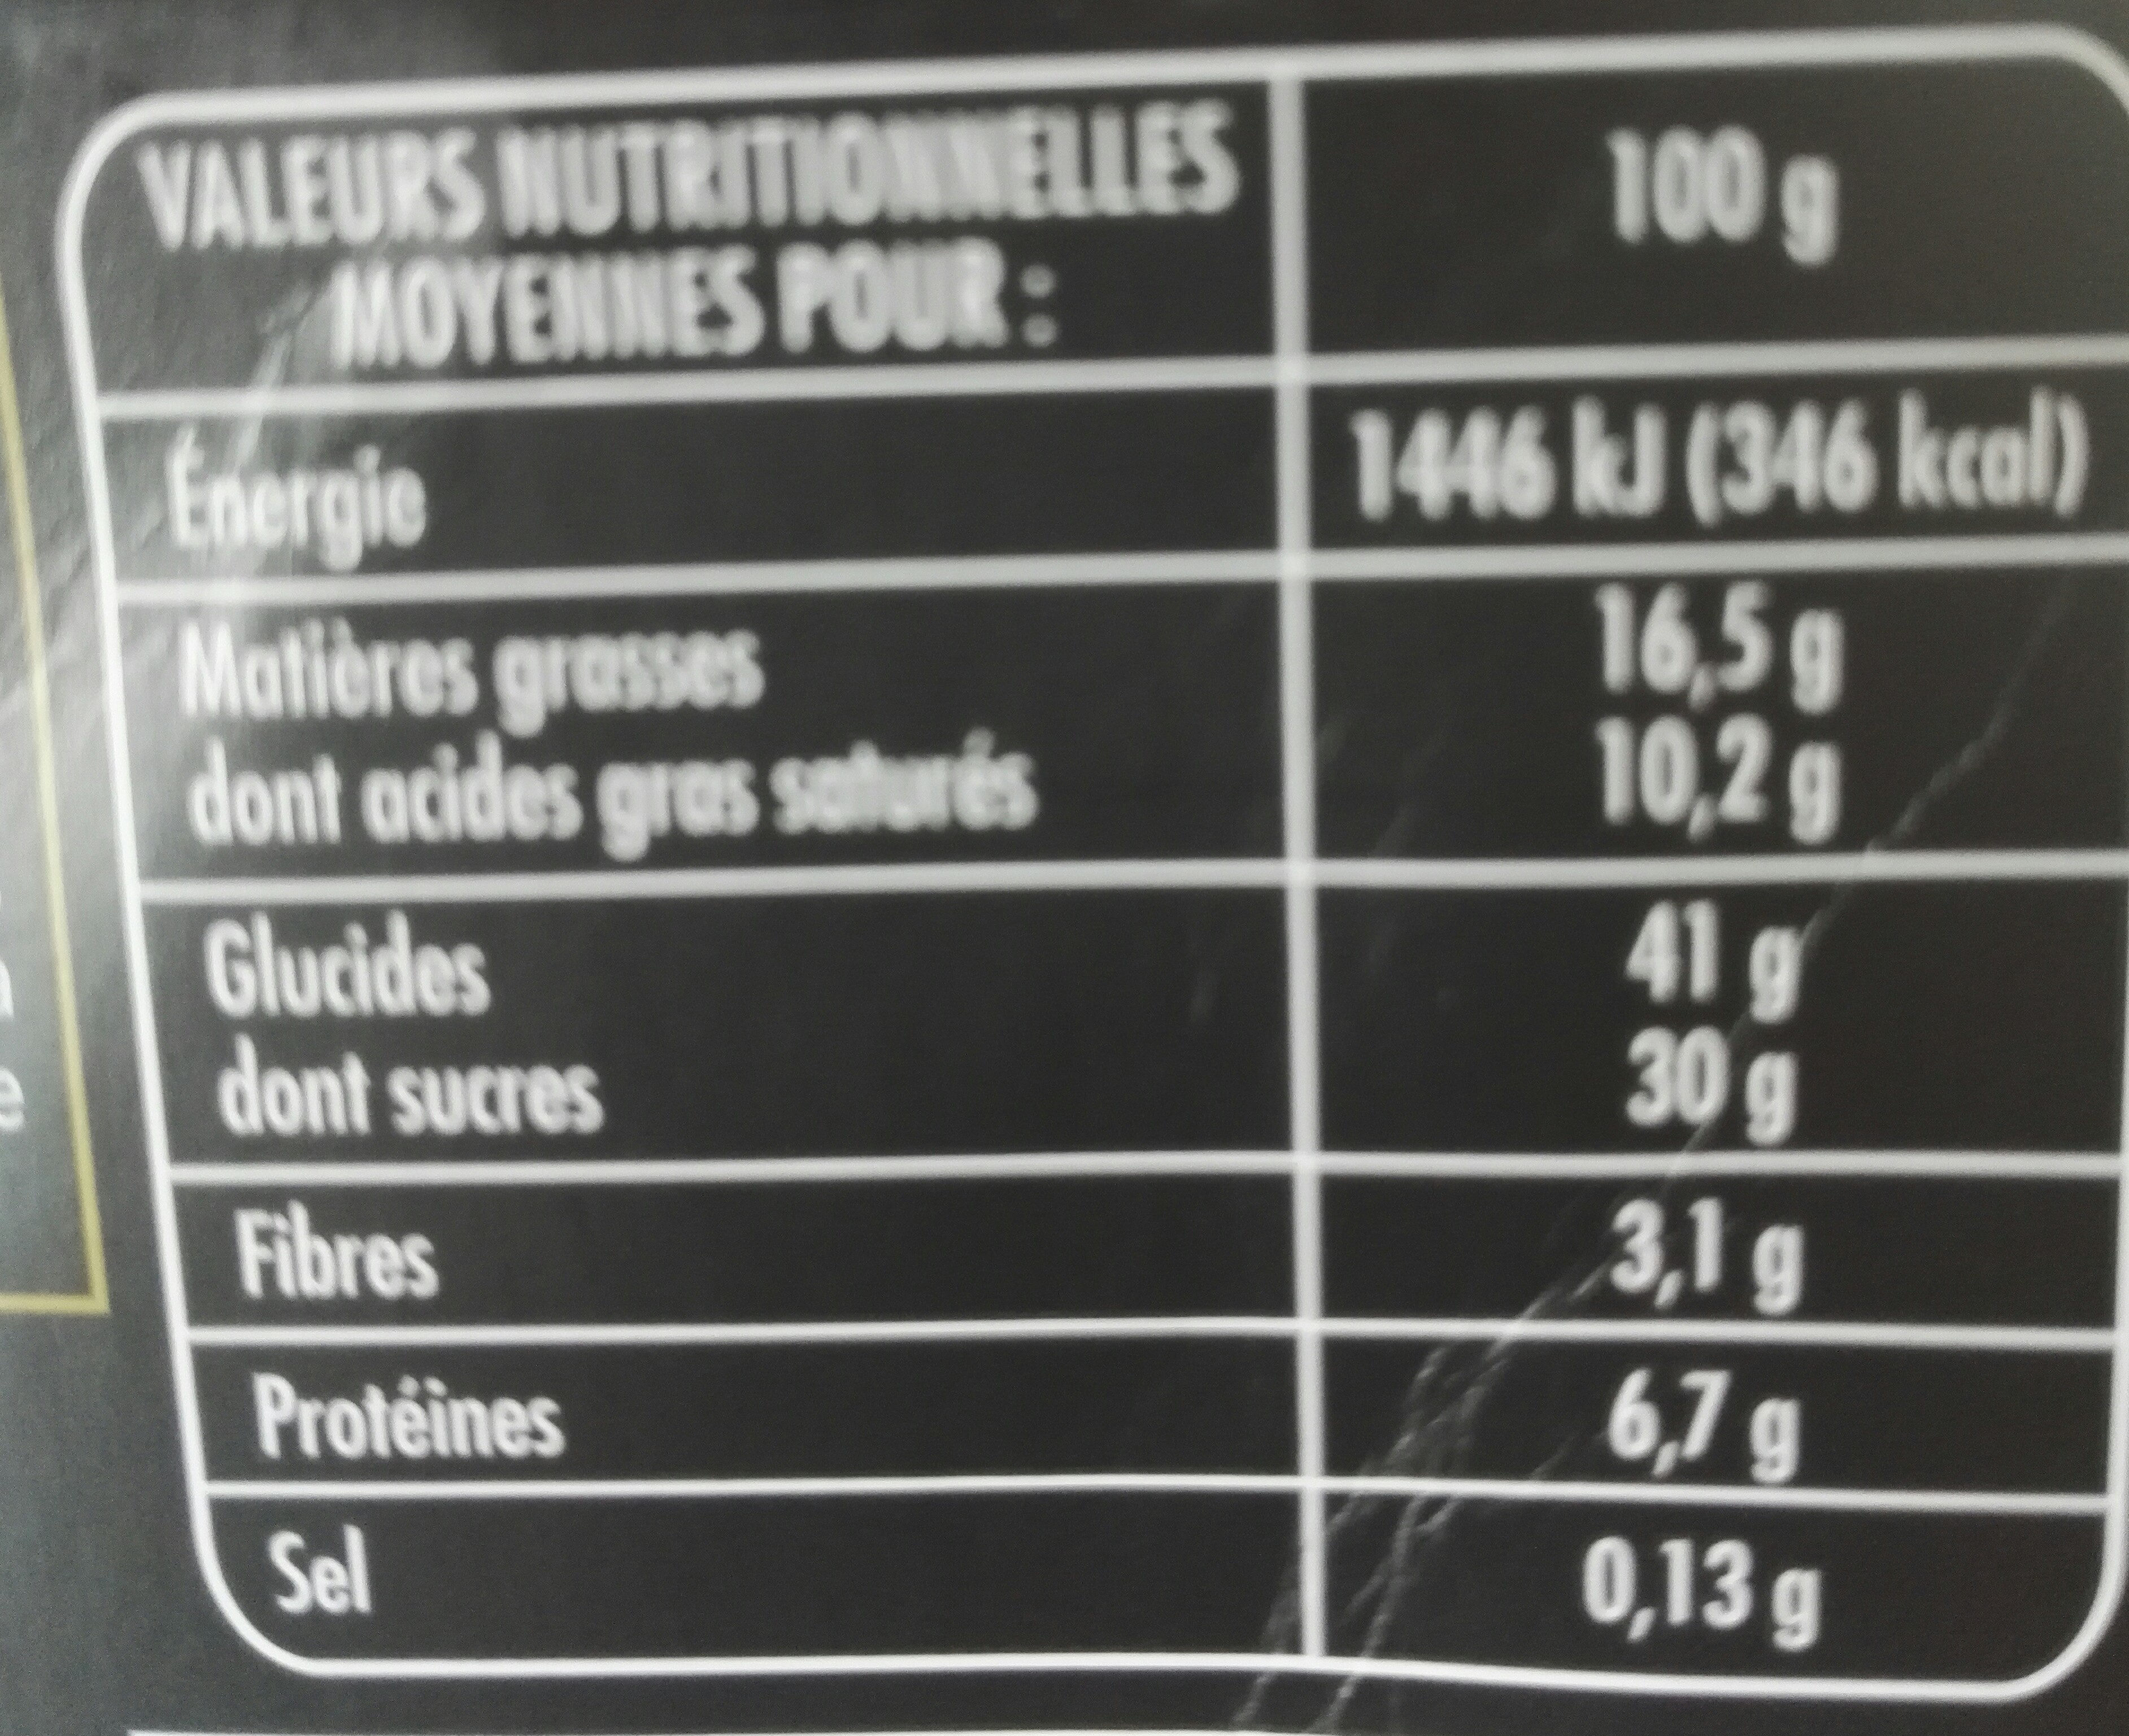 Coeur Fondant Chocolat - Nutrition facts - fr